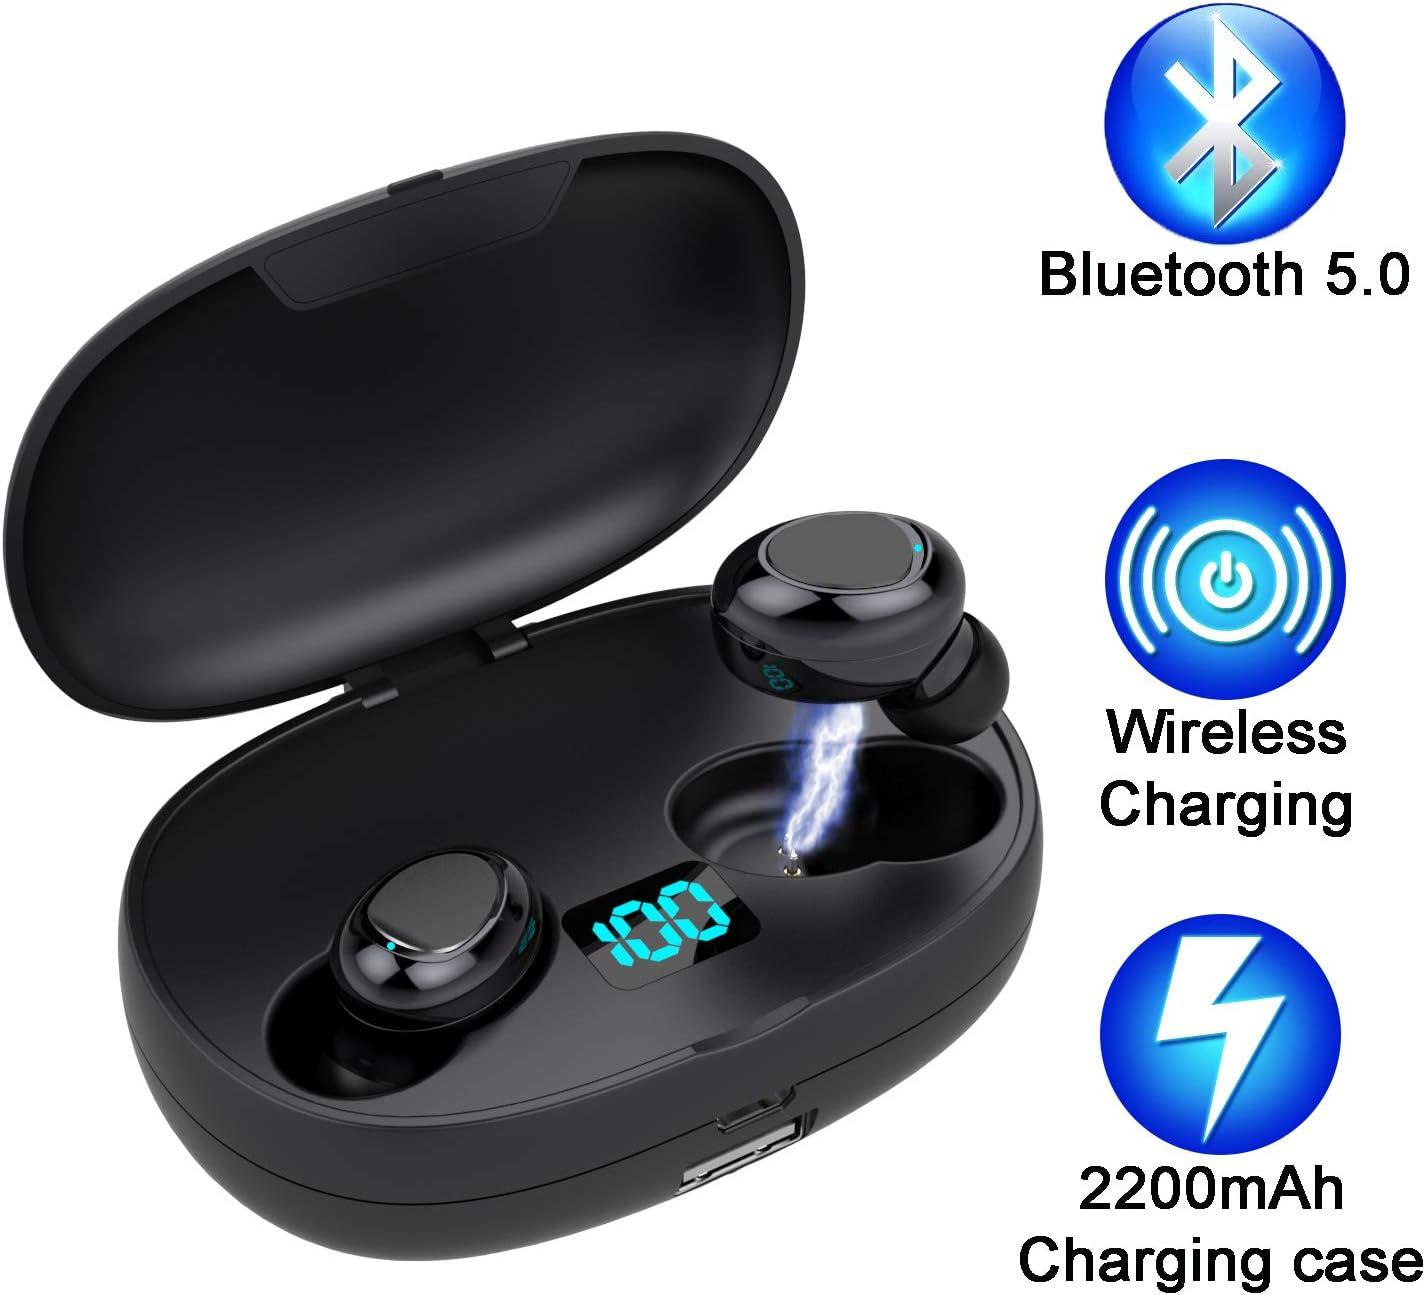 Auriculares Bluetooth 5.0 de Hasta 50 Horas de Reproducción, Sonido Estéreo de Graves Profundos, Cancelación de Ruido Avanzada, Auriculares Inalámbricos con Estuche de Carga Inalámbrico de 2200 mAh